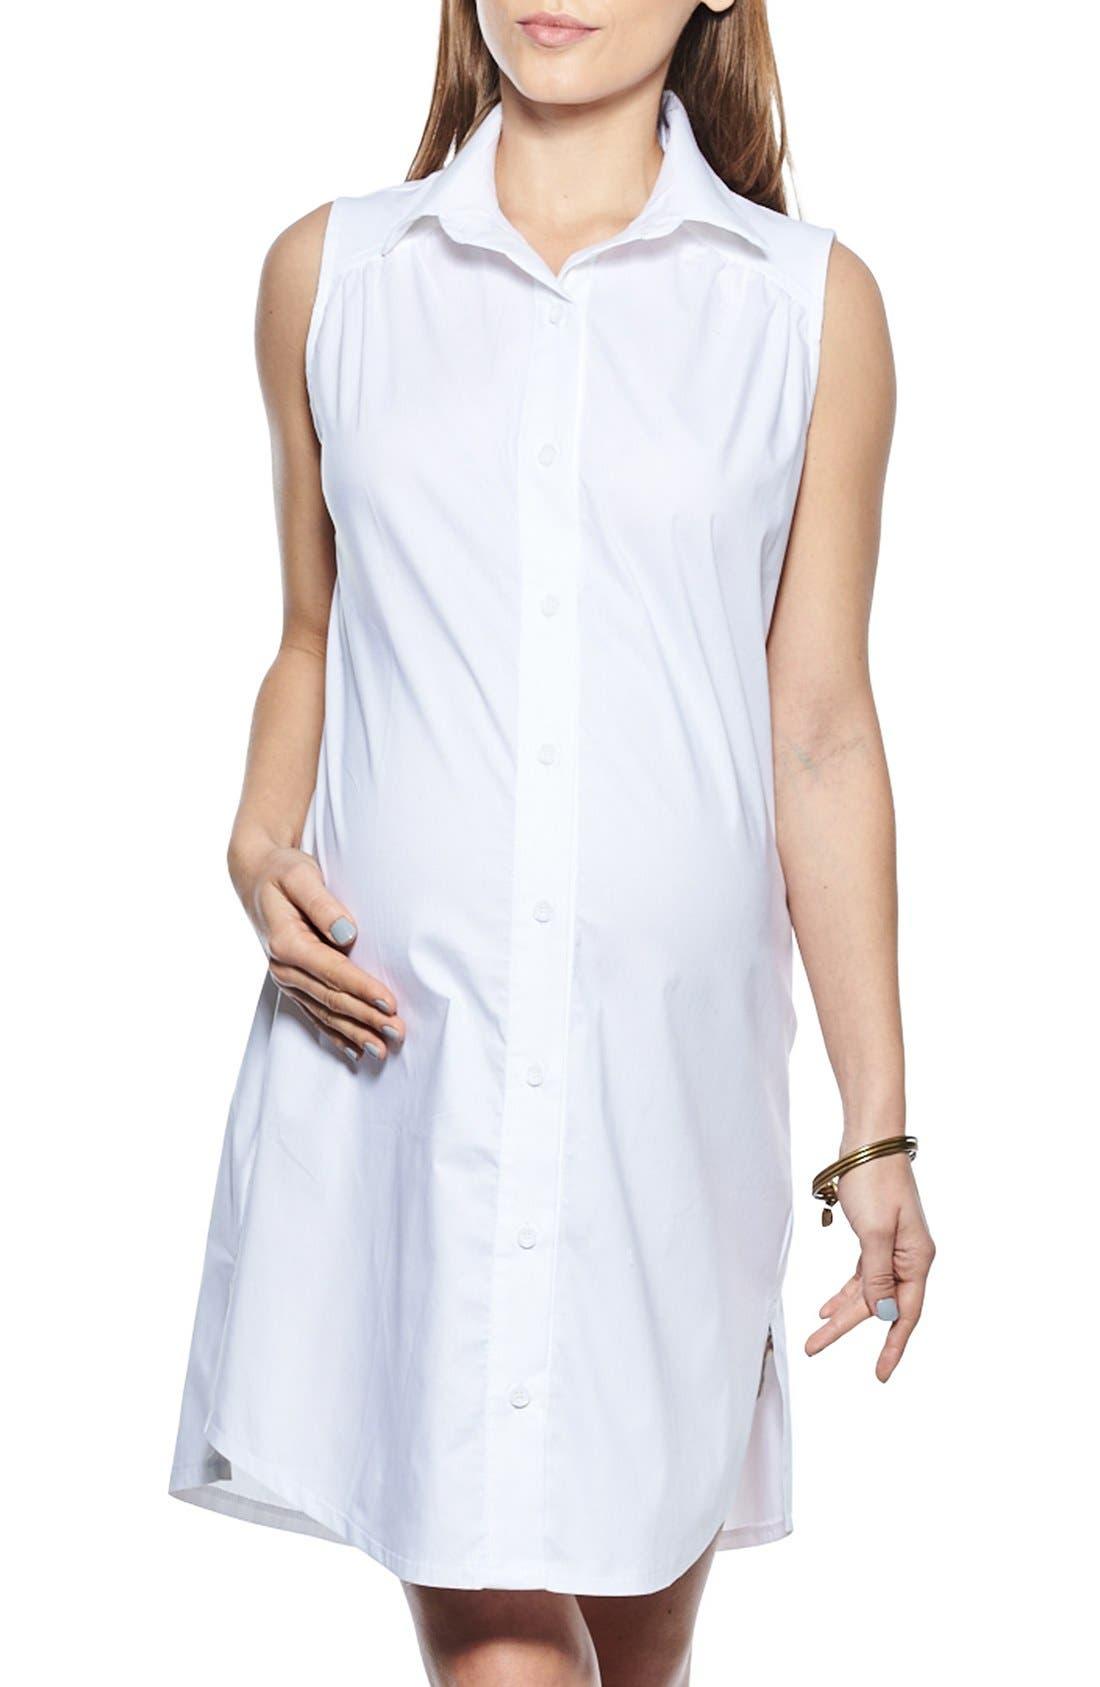 Imanimo Button Down Maternity Shirtdress